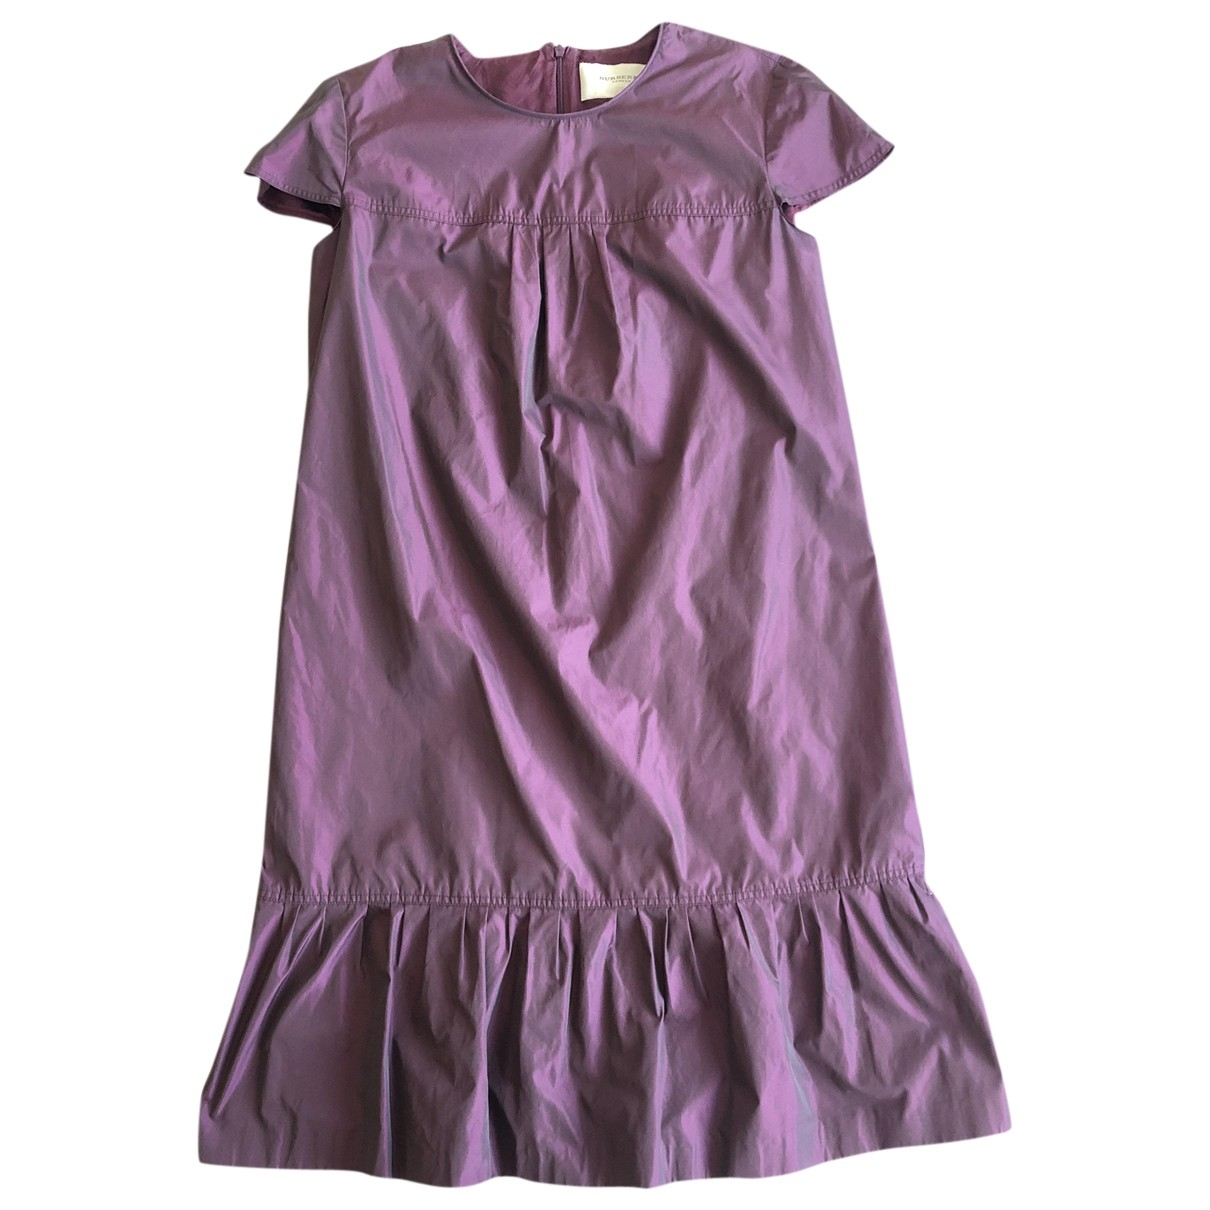 Burberry \N Burgundy dress for Women 42 IT